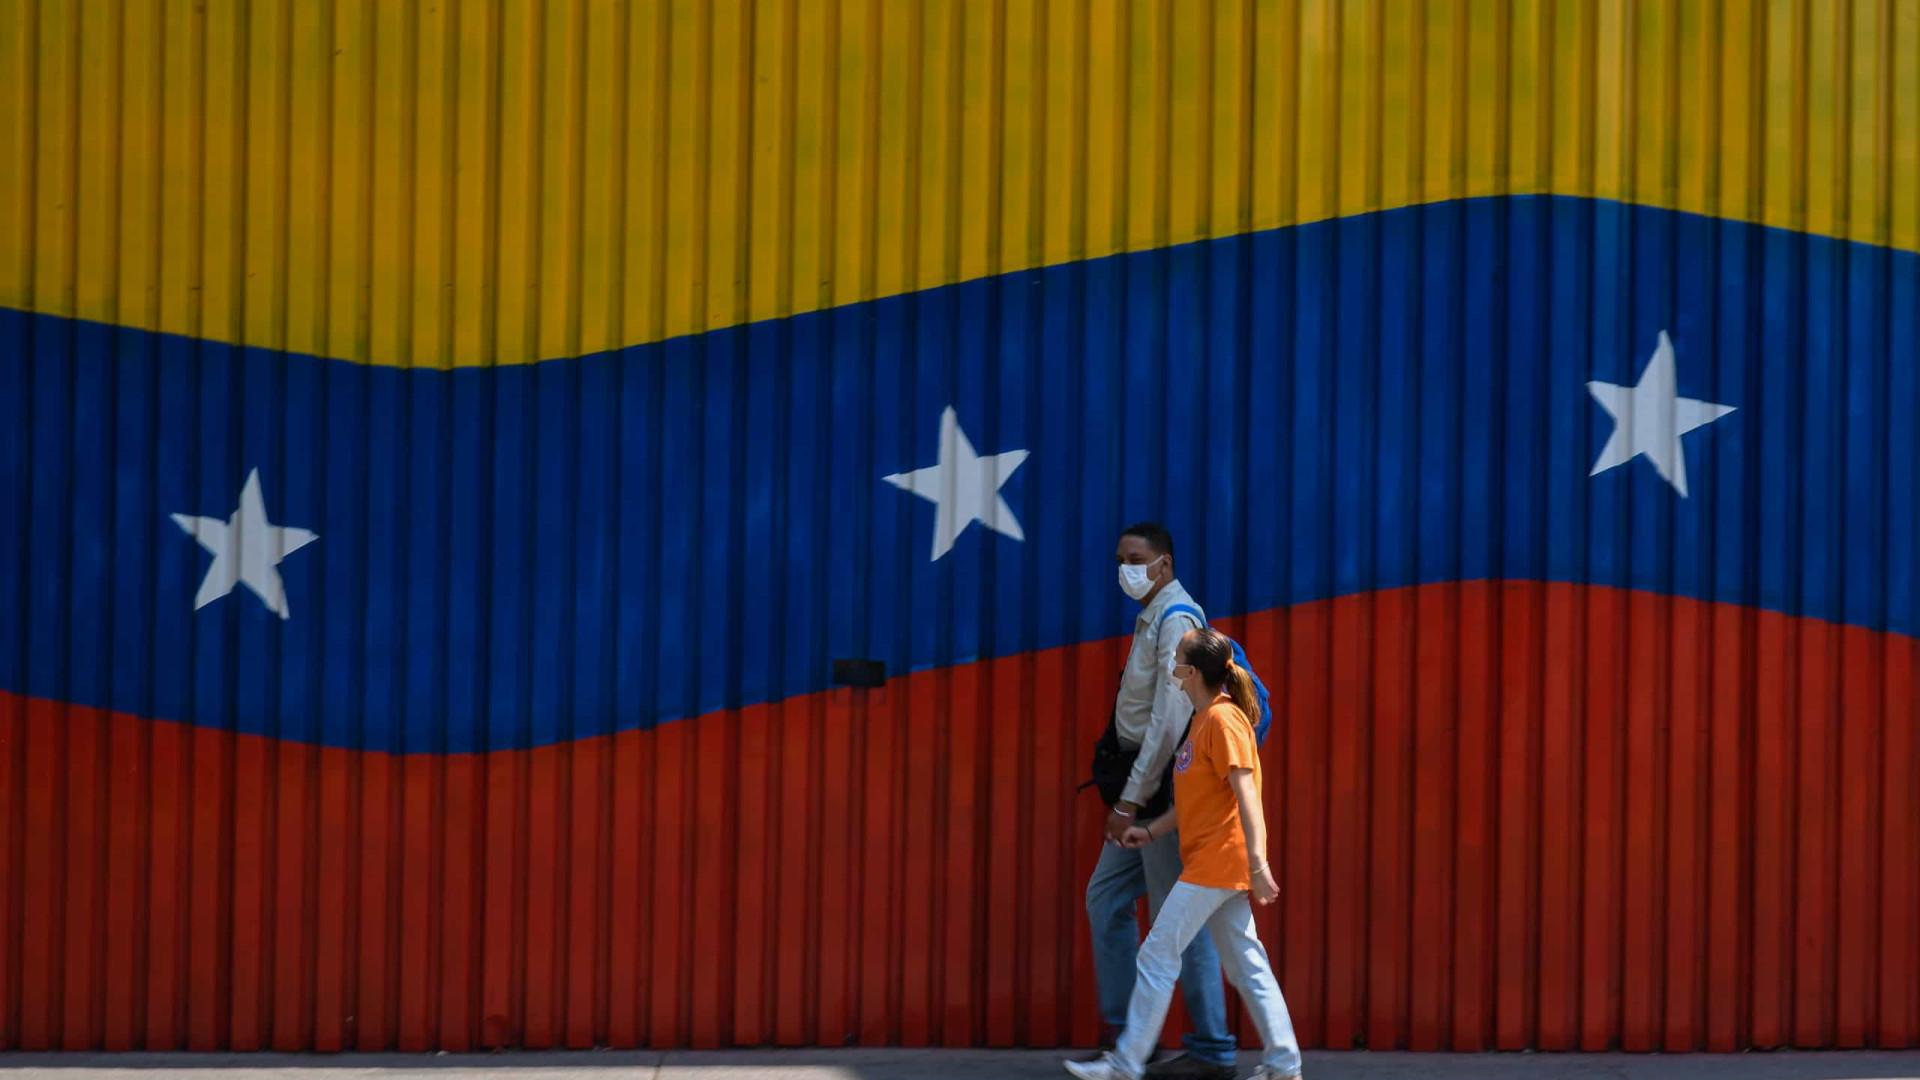 Venezuela: Eleições legislativas marcadas para 6 de dezembro